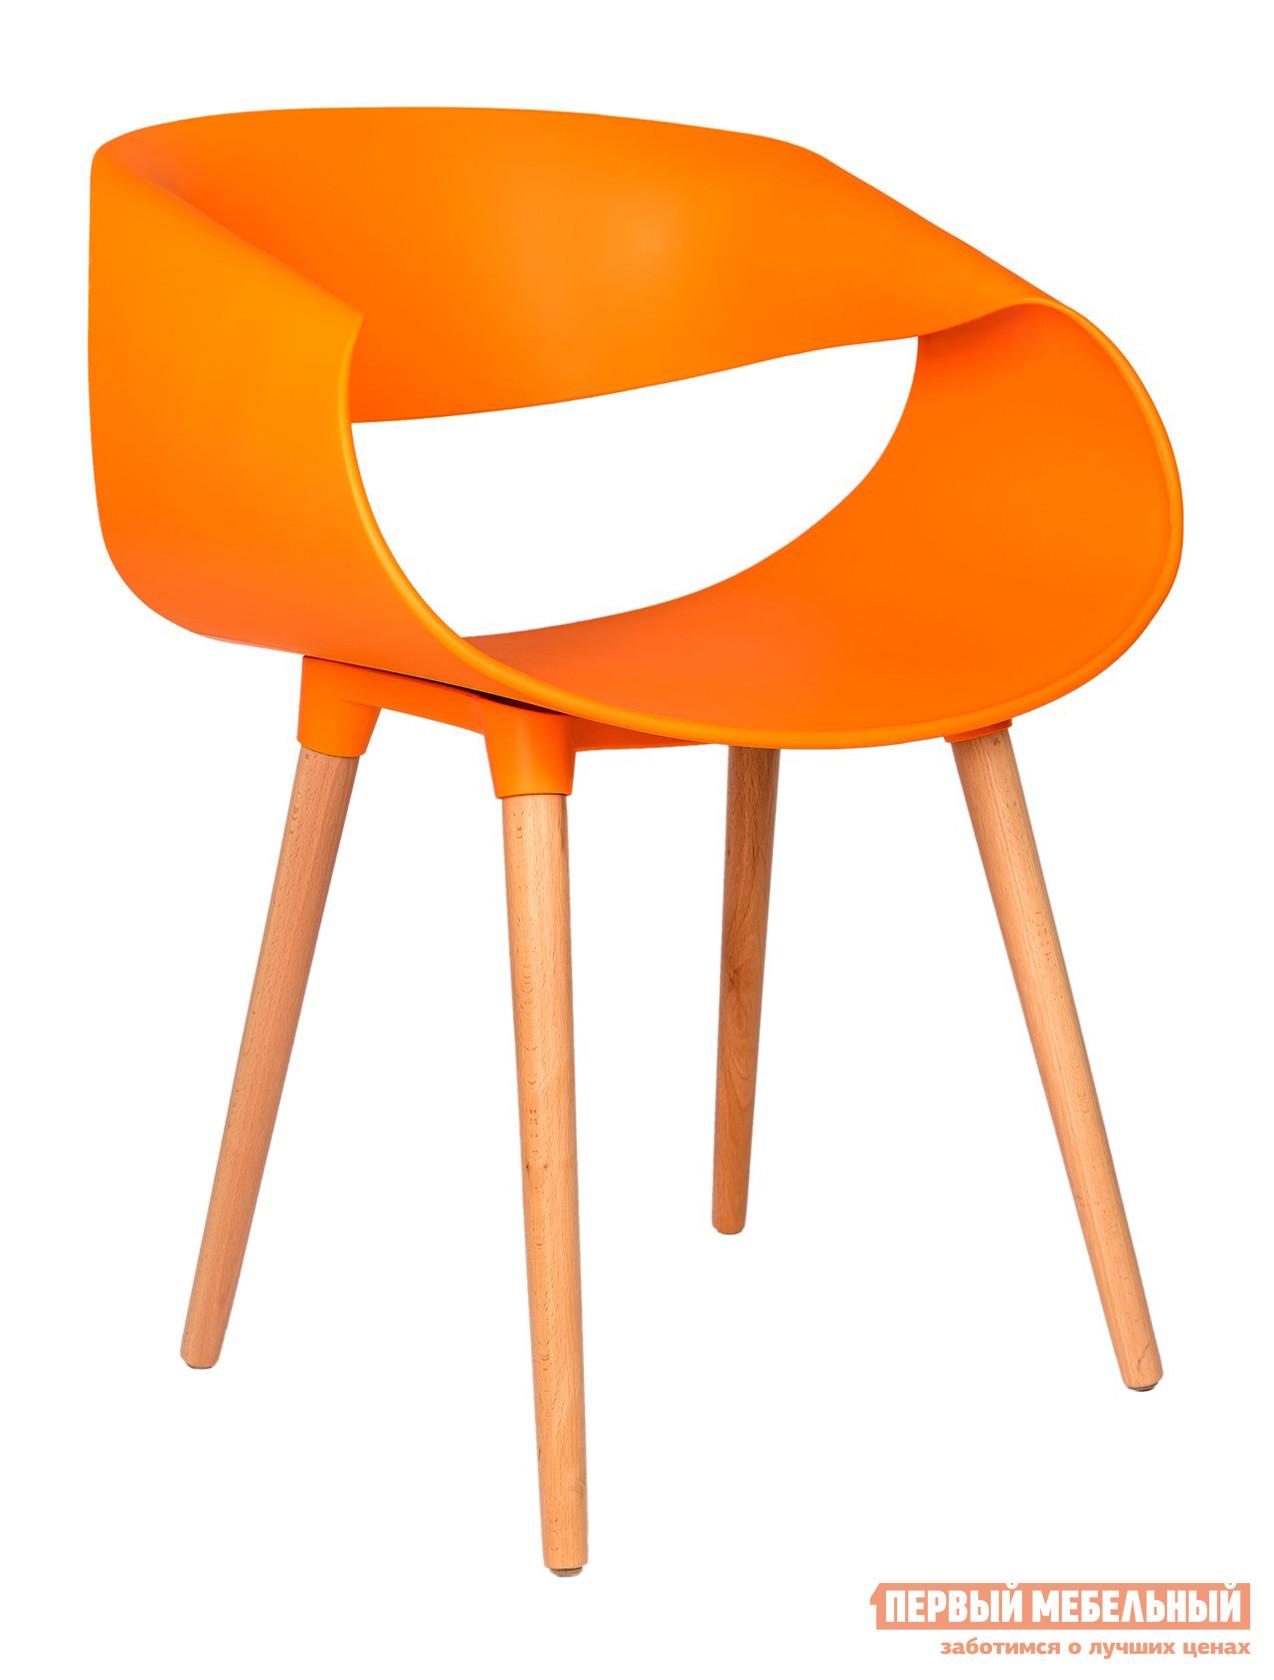 Кухонный стул STOOL GROUP TAPE Оранжевый от Купистол